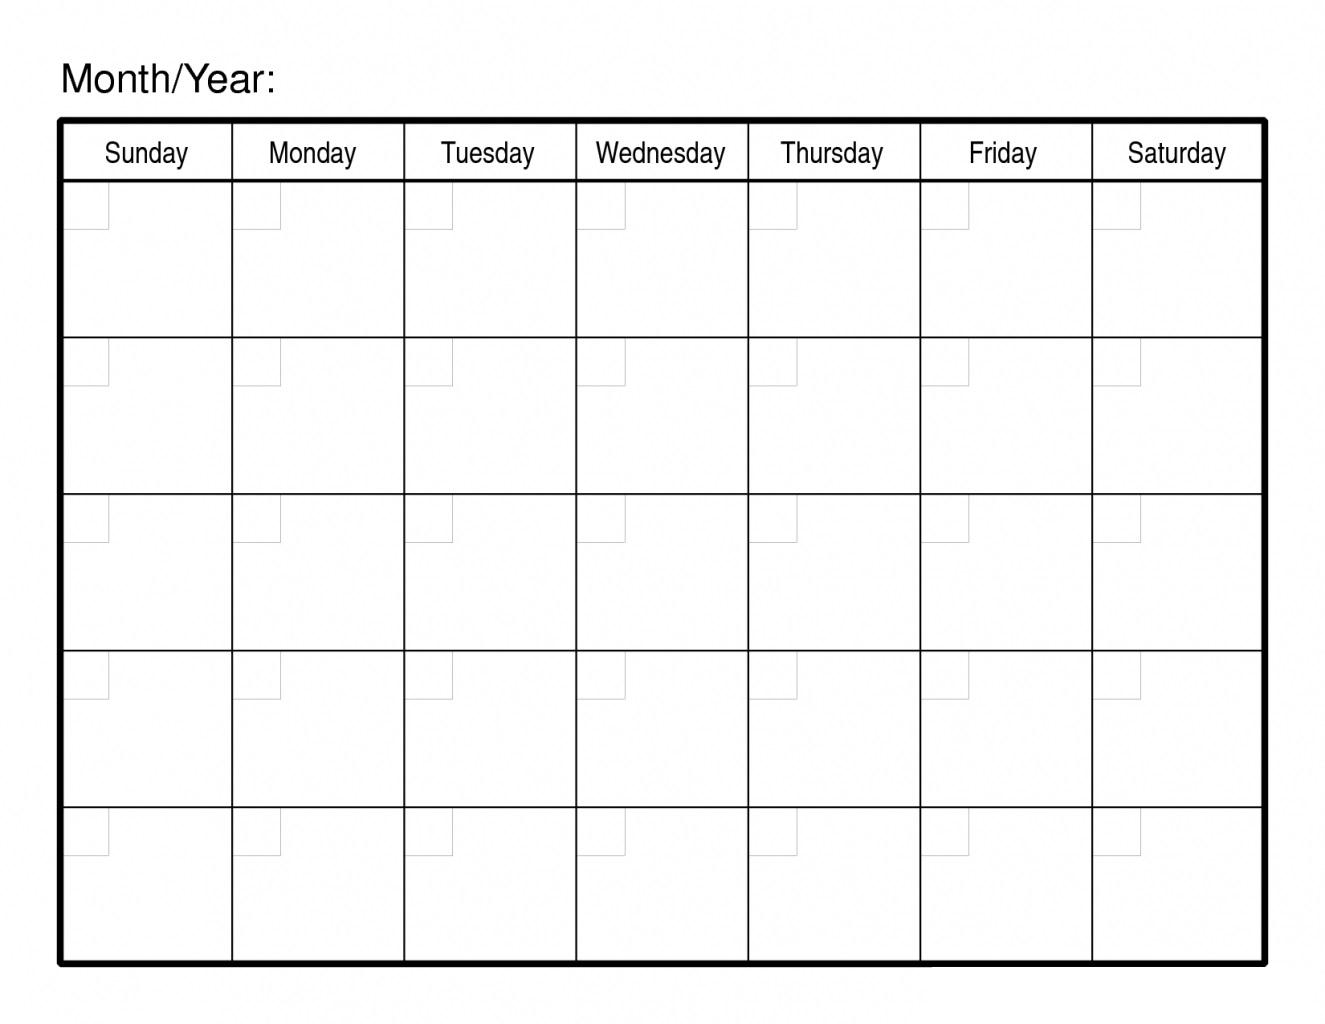 30 Day Free Blank Calendar Printable Template | Free Printable in Blank 30 Day Month Calendar